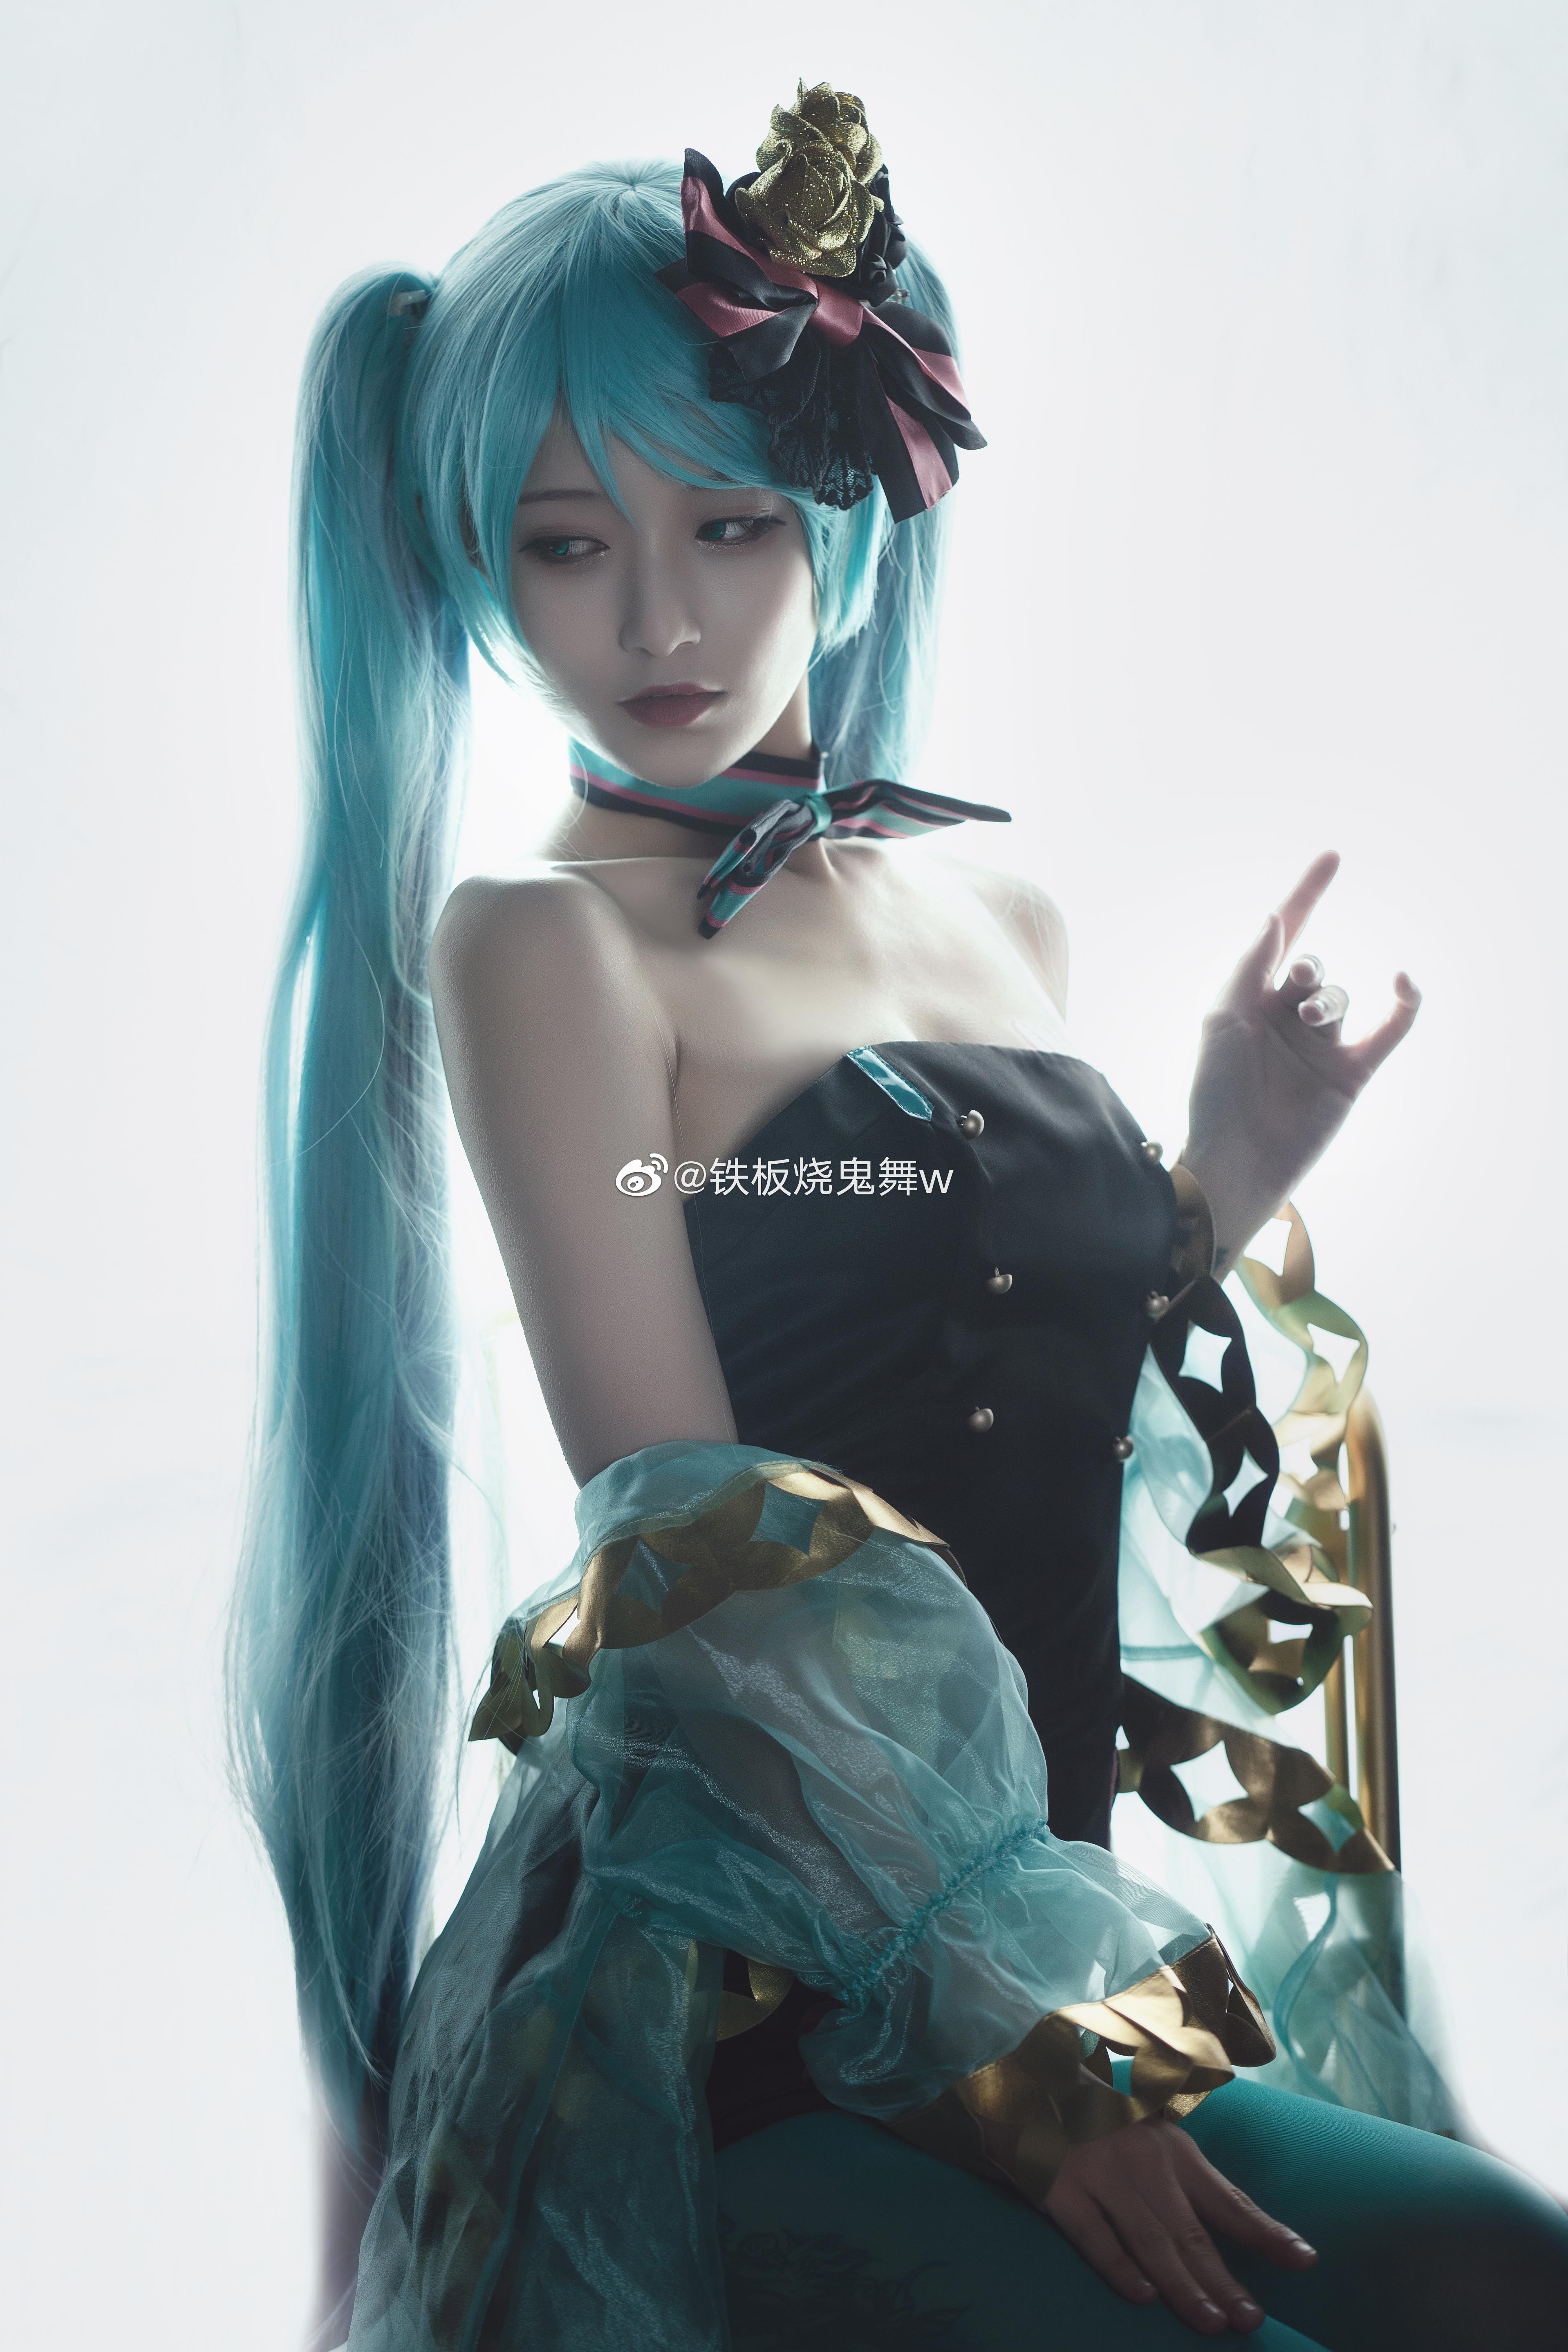 [COS]初音miku 初音未来 @铁板烧鬼舞w COSPLAY-第13张